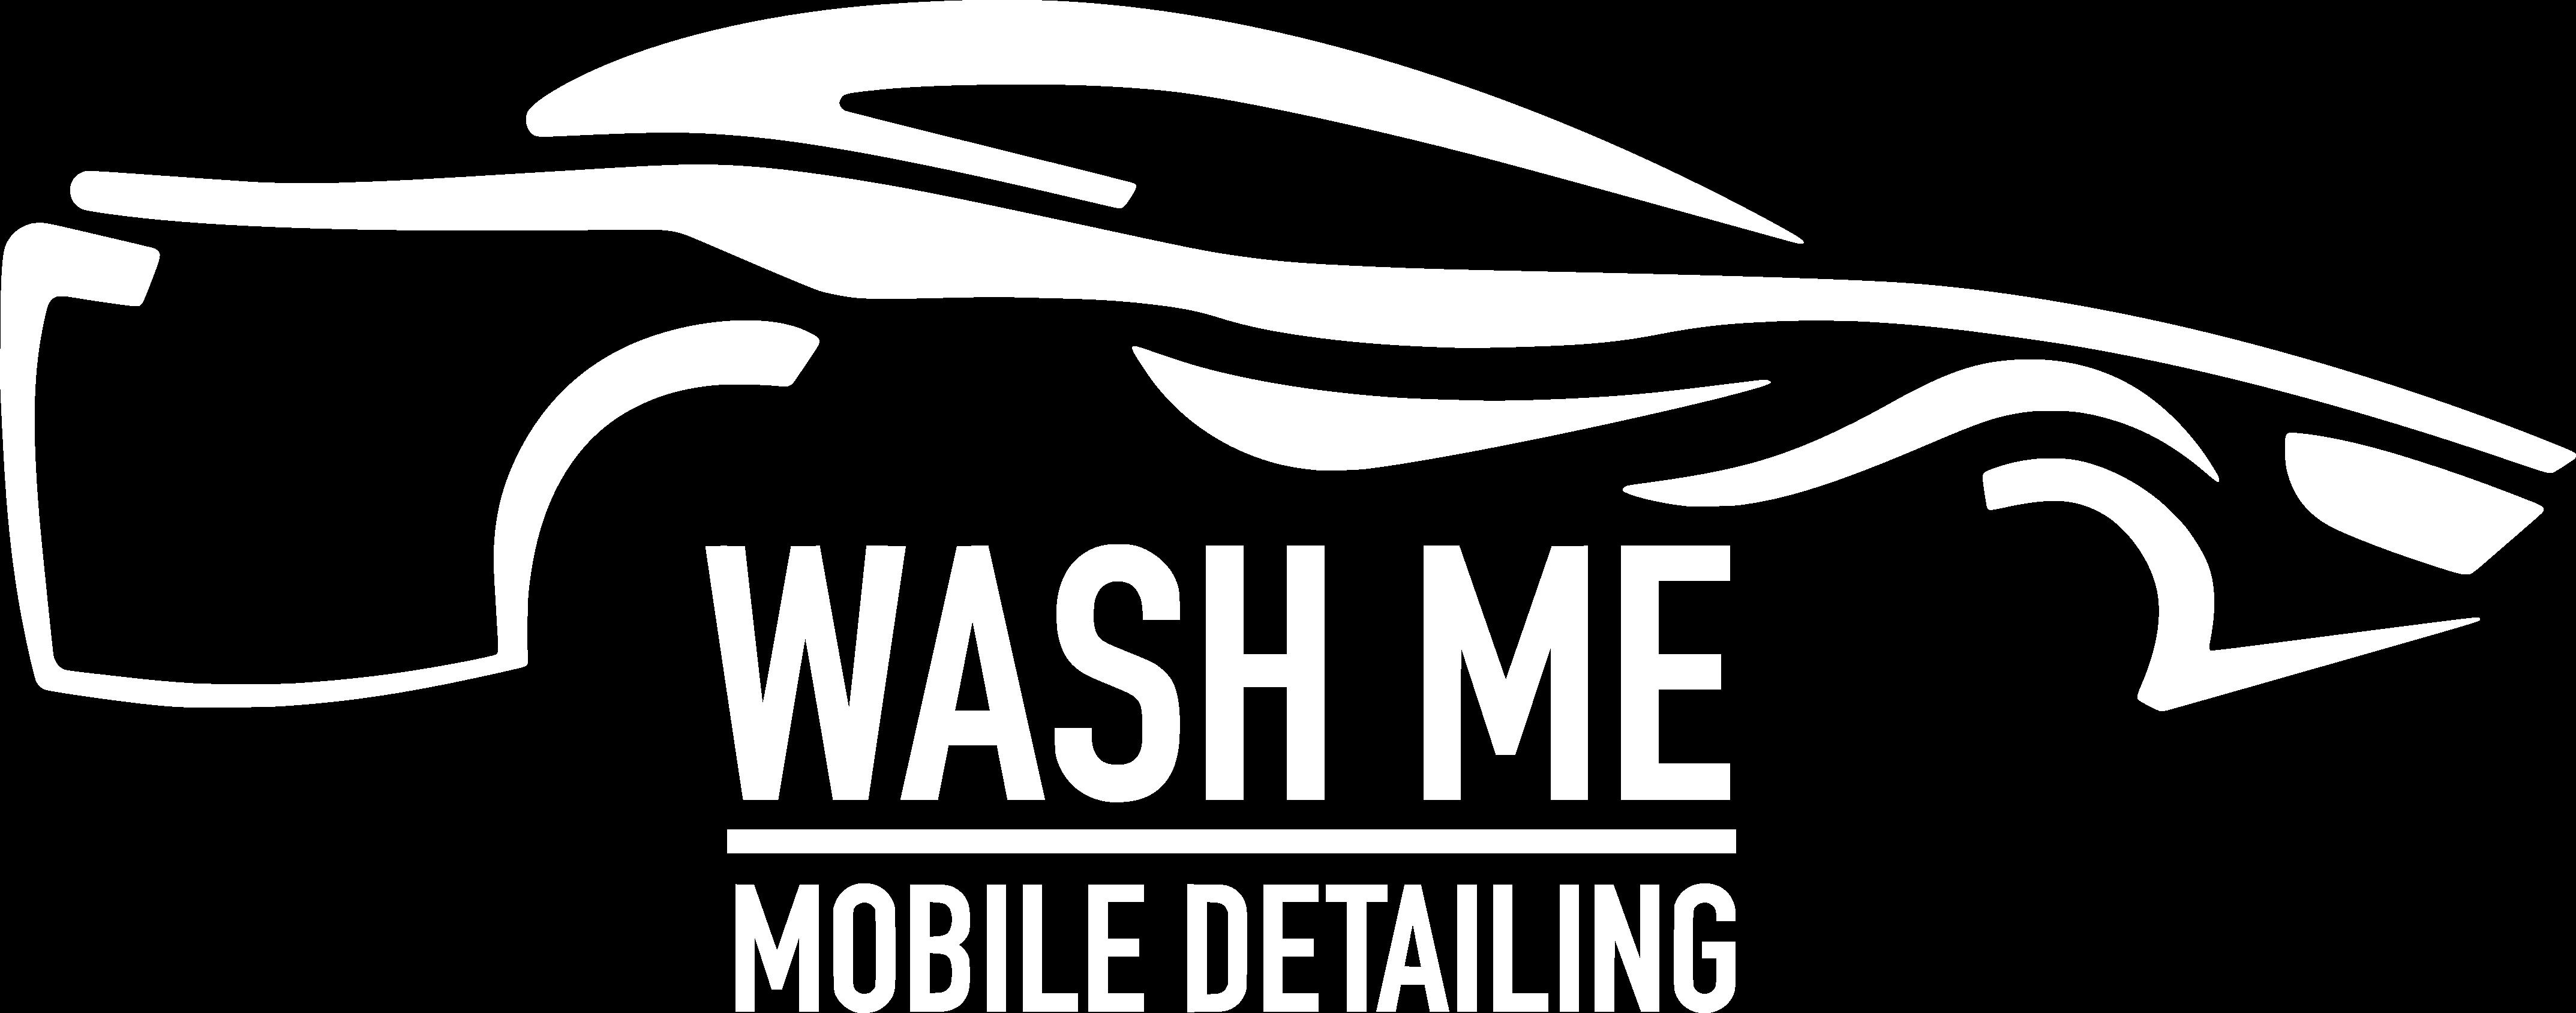 Wash me White